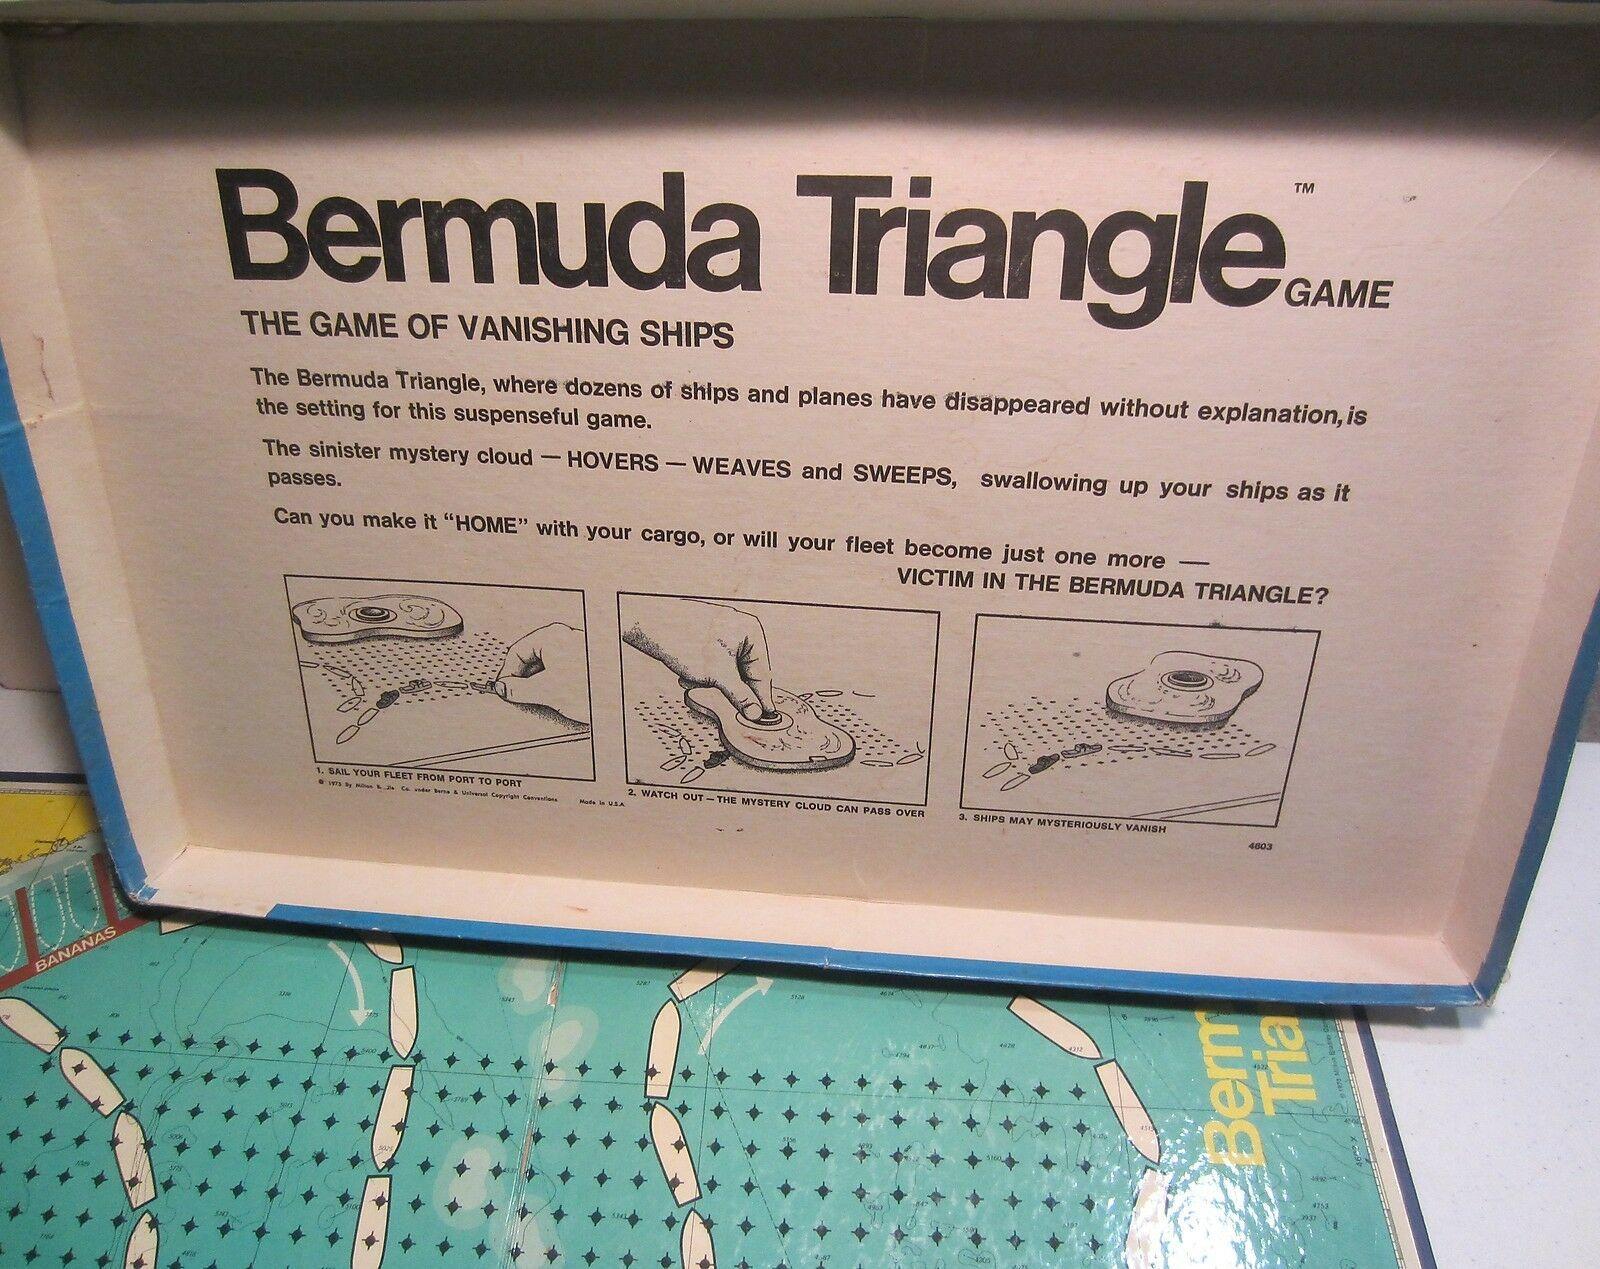 Vintage  Bermuda Triangle board game - complete image 3